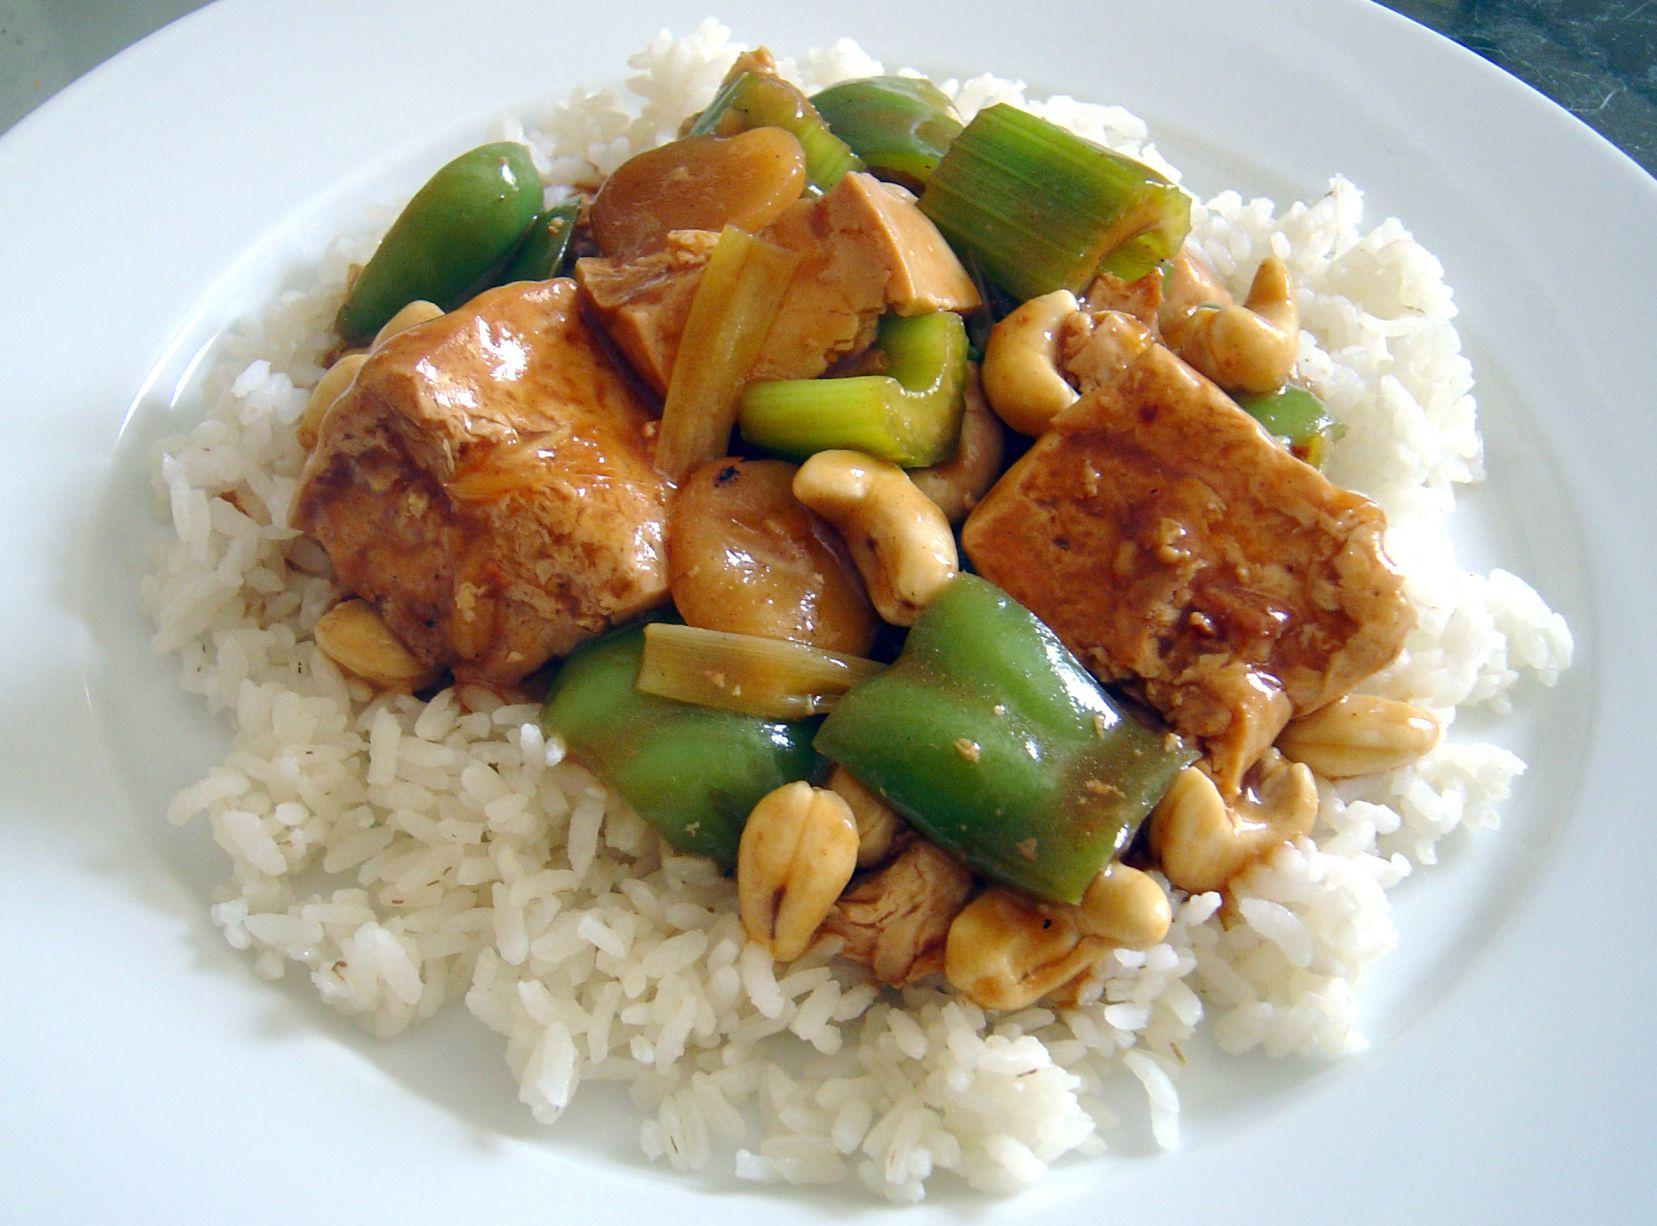 Vegetarian and Vegan Tofu Stir-fry Recipes